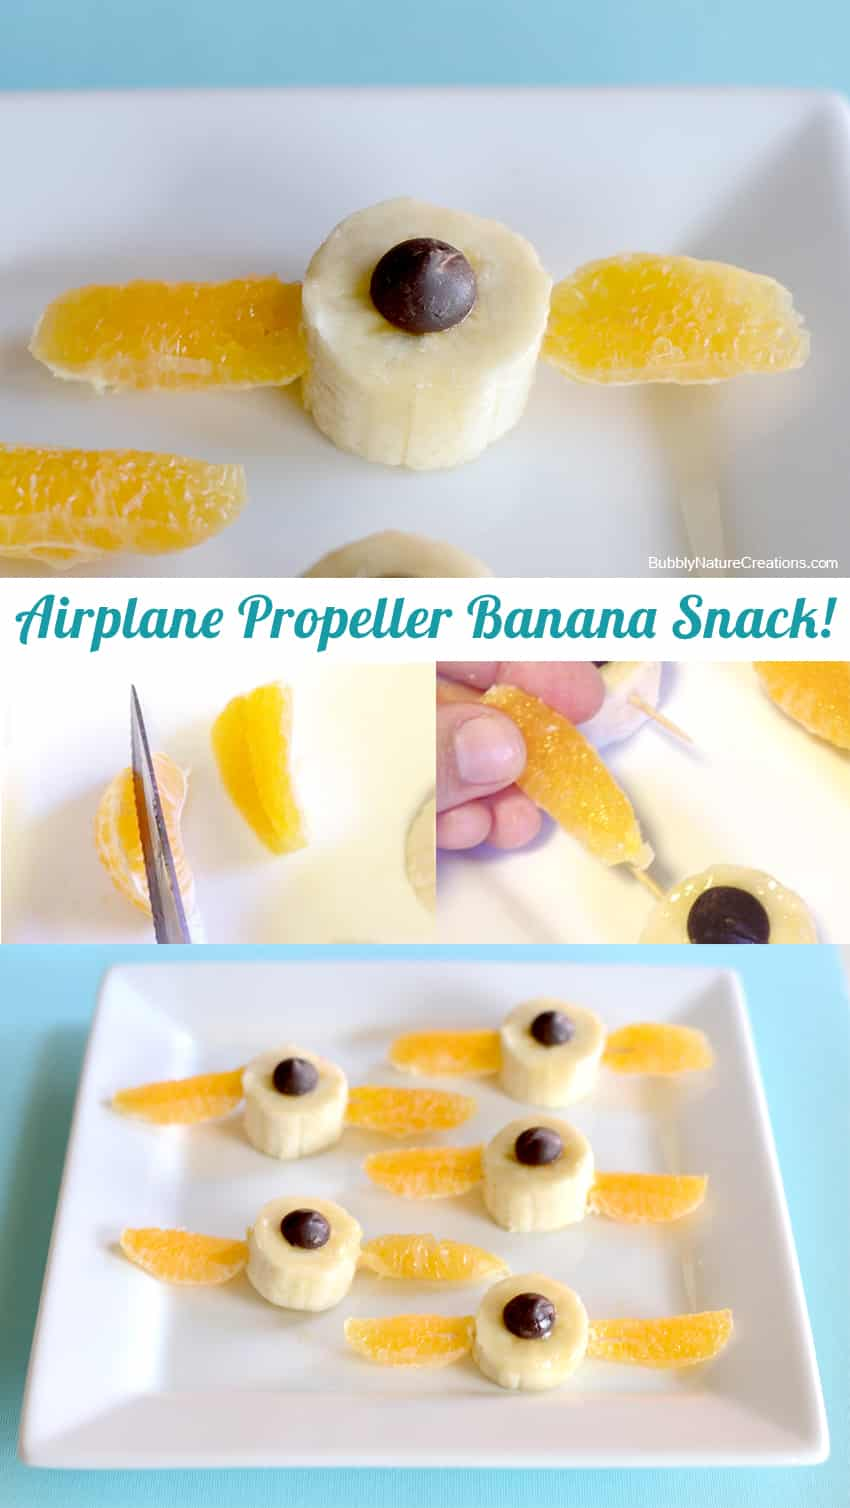 Airplane Propeller Banana Snack2